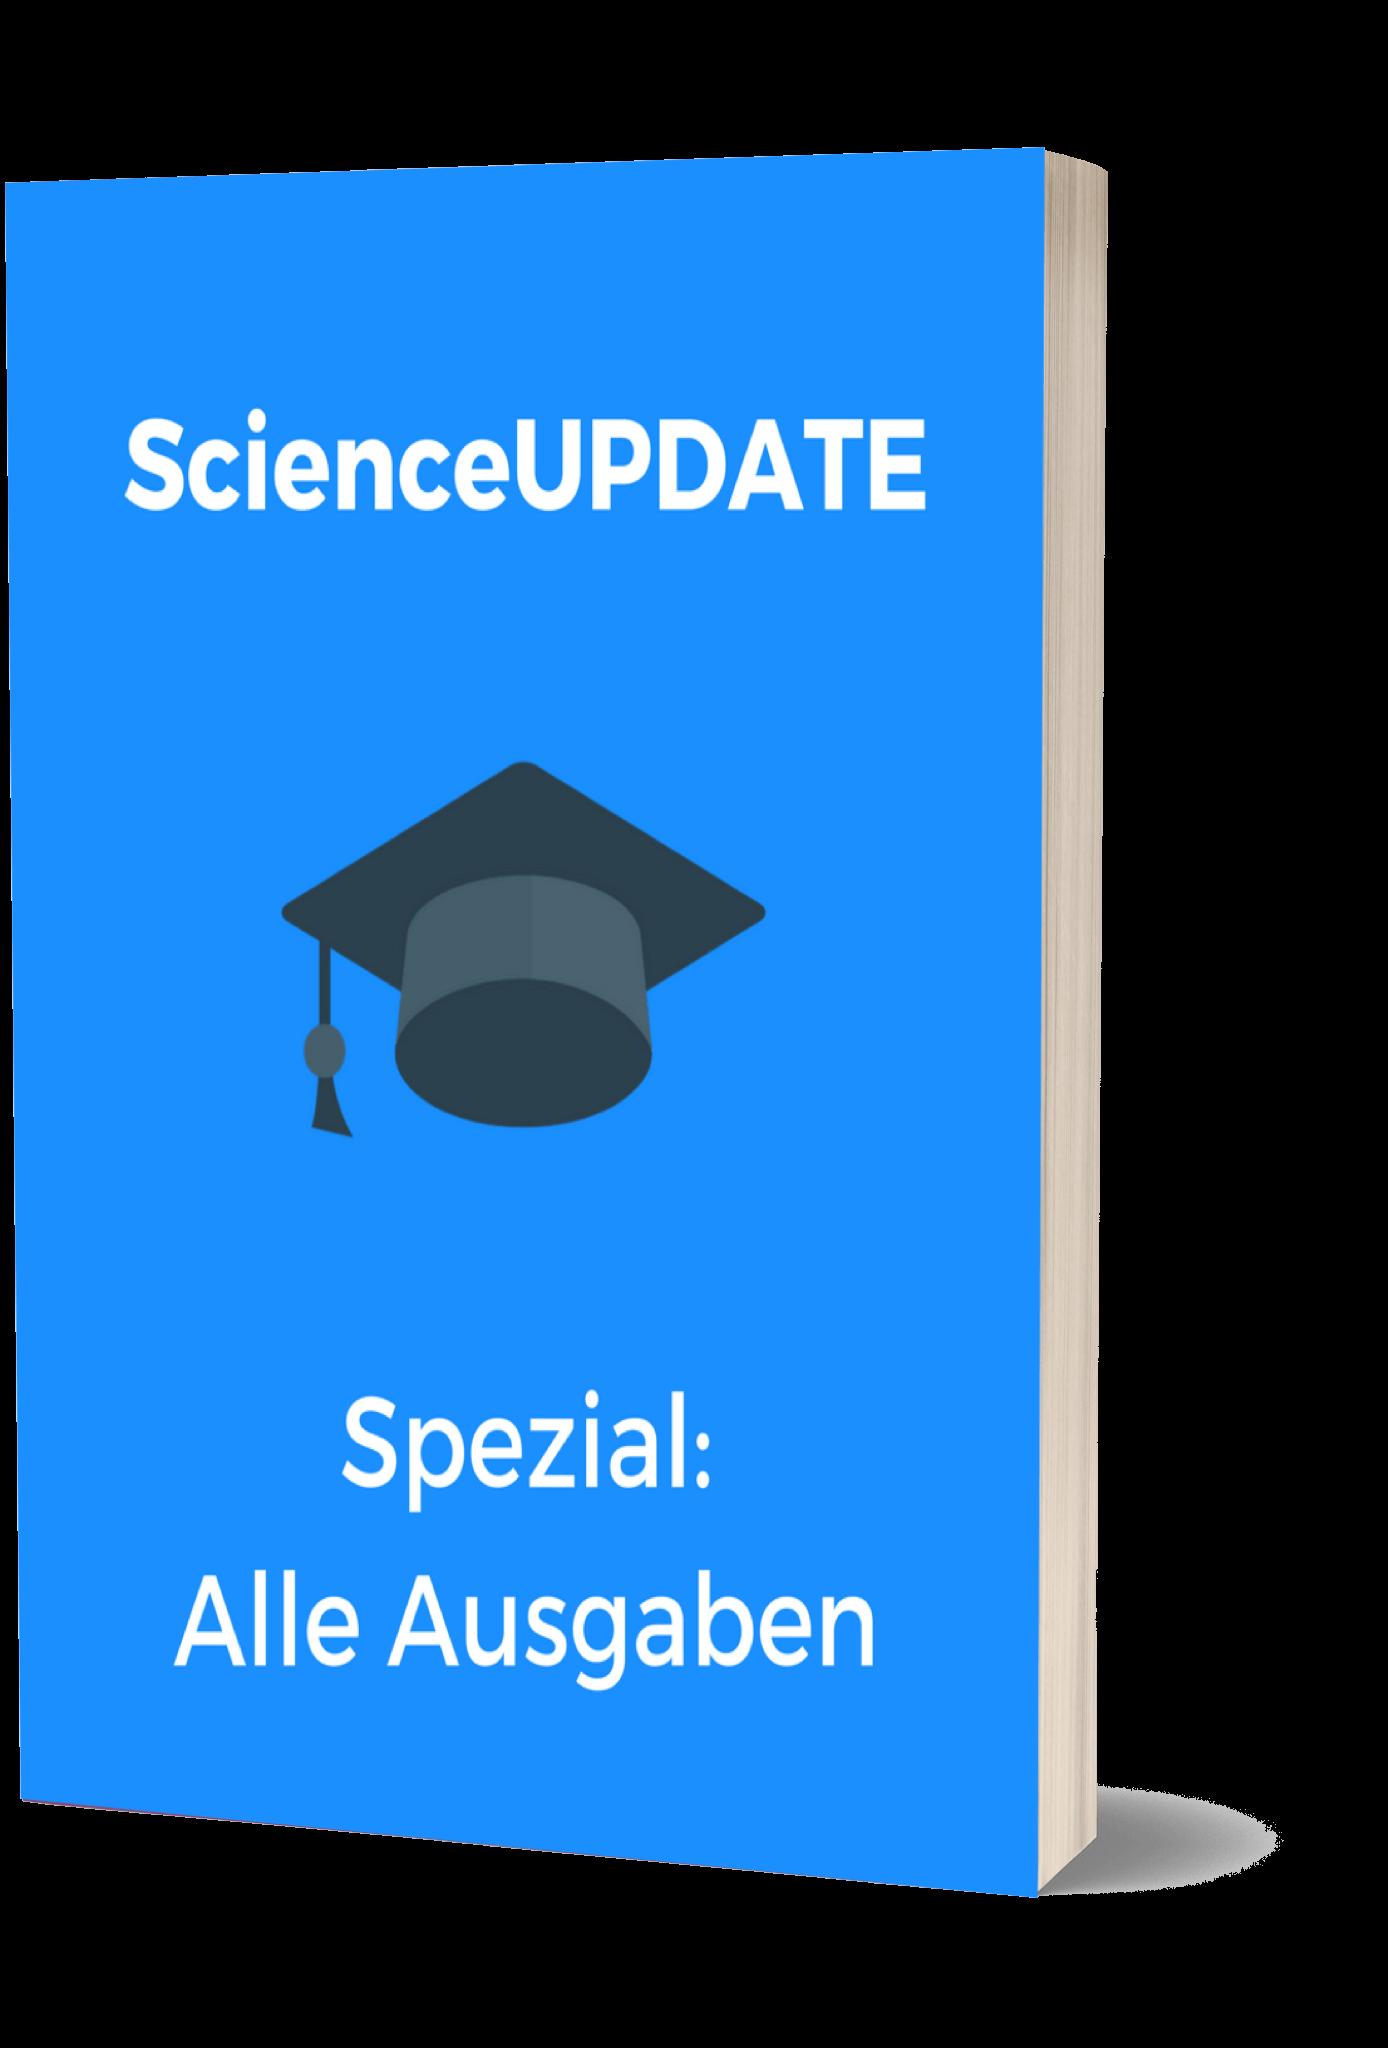 scienceupdate_Alle-ausgaben-mockup.png